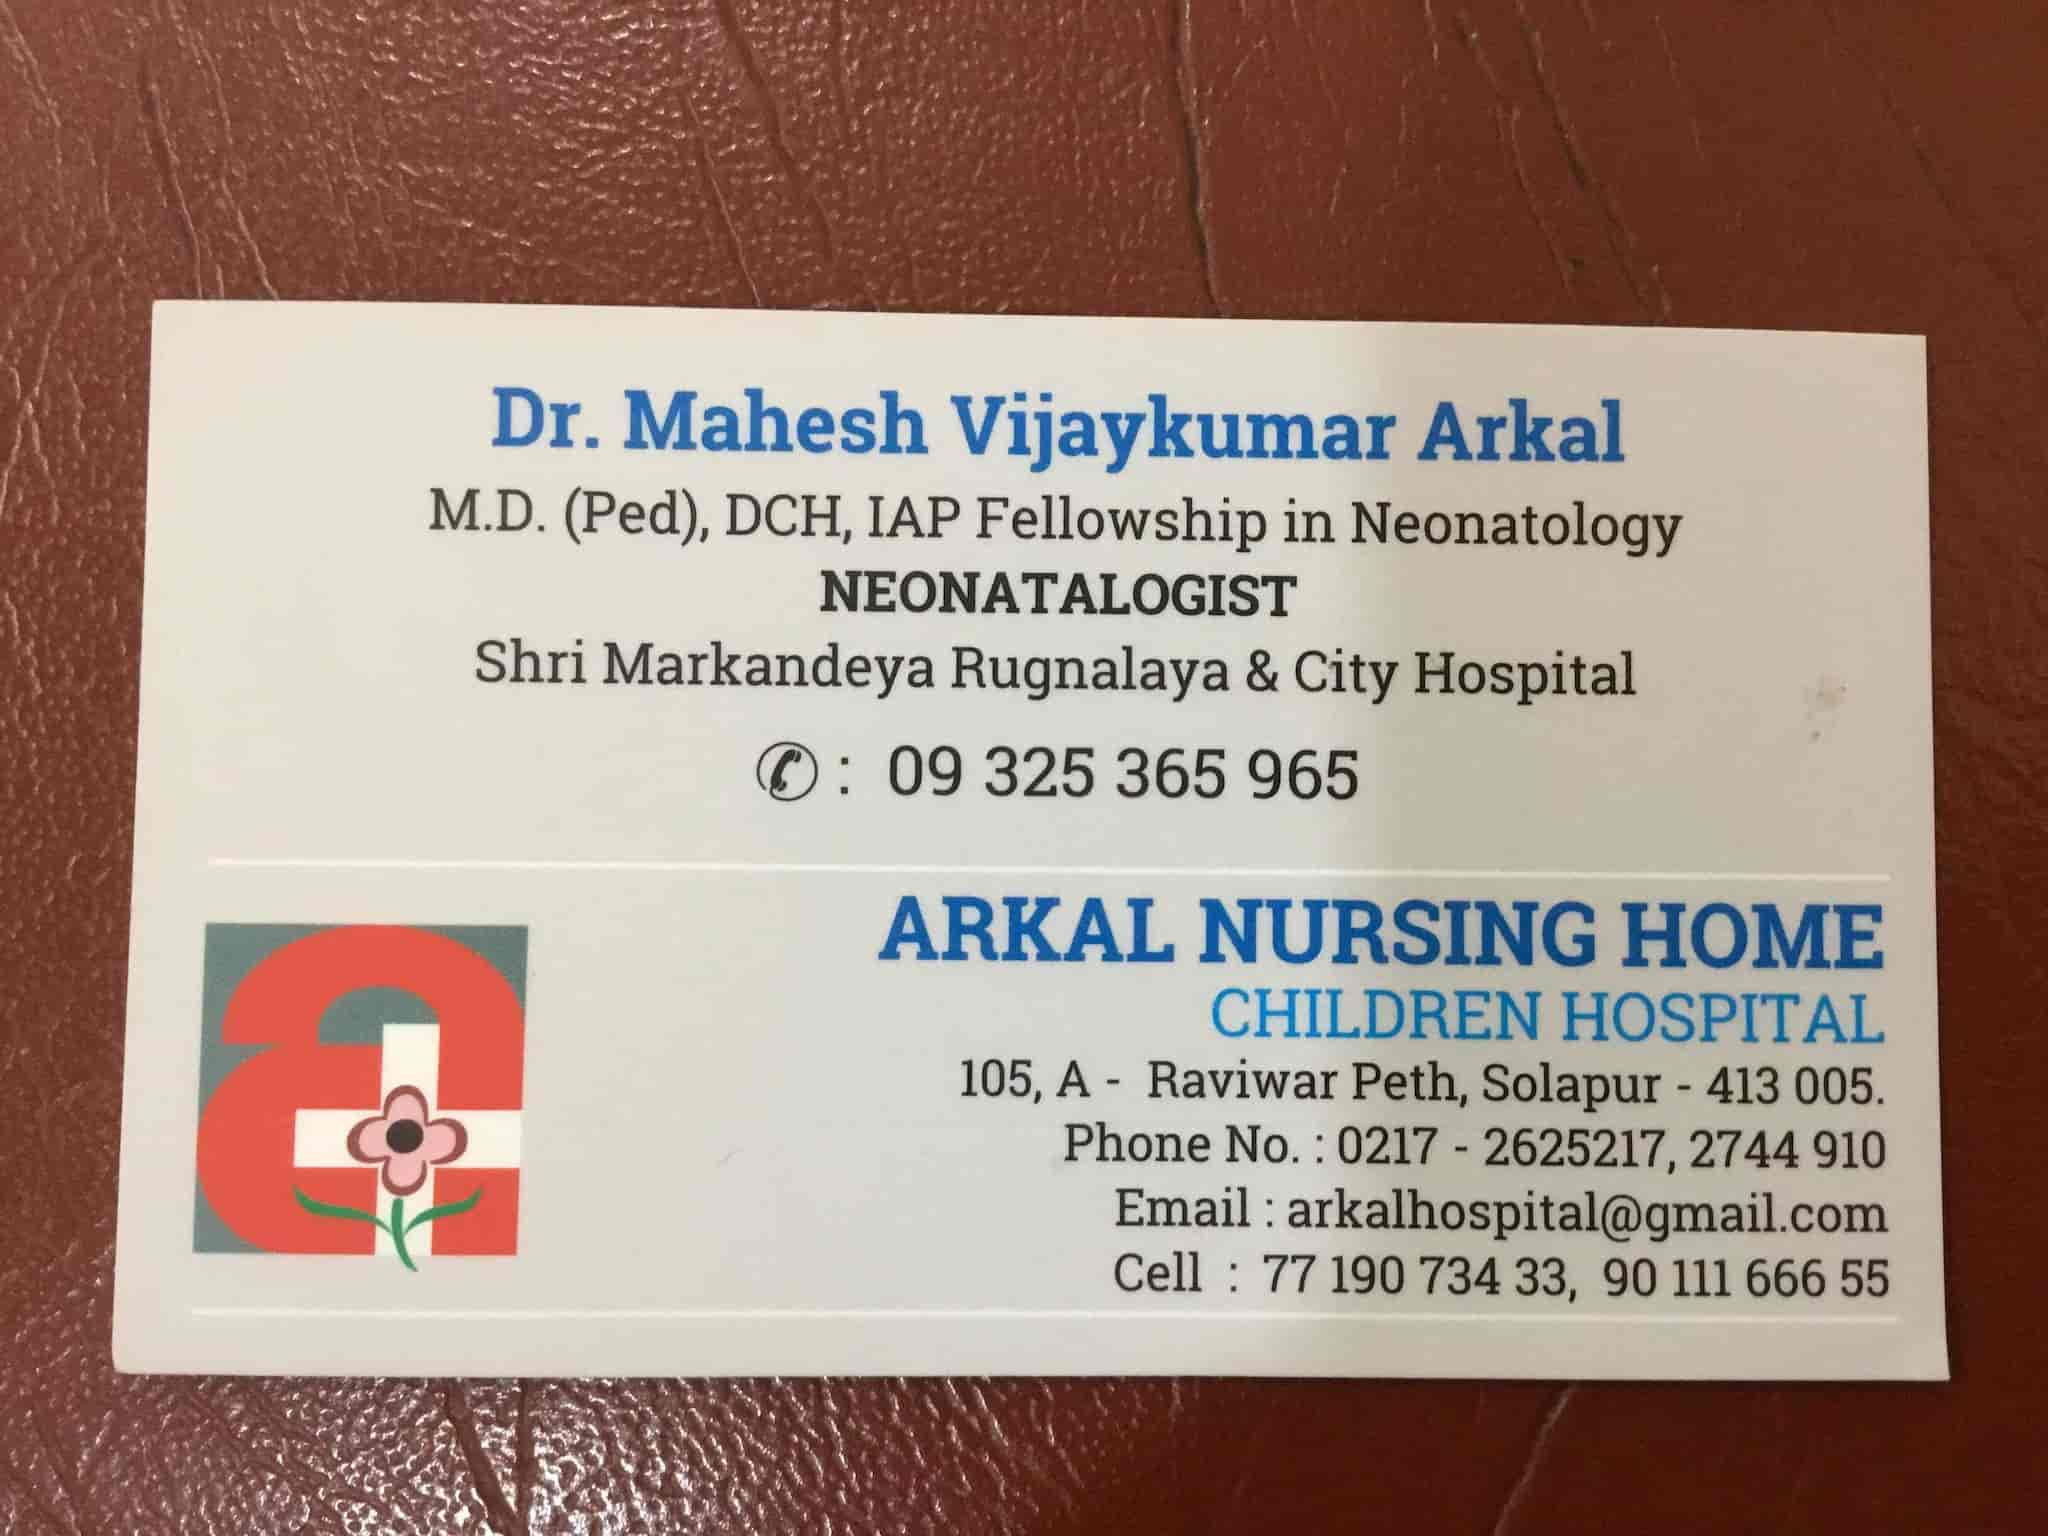 Arkal Nursing Home - Children Hospitals - Book Appointment